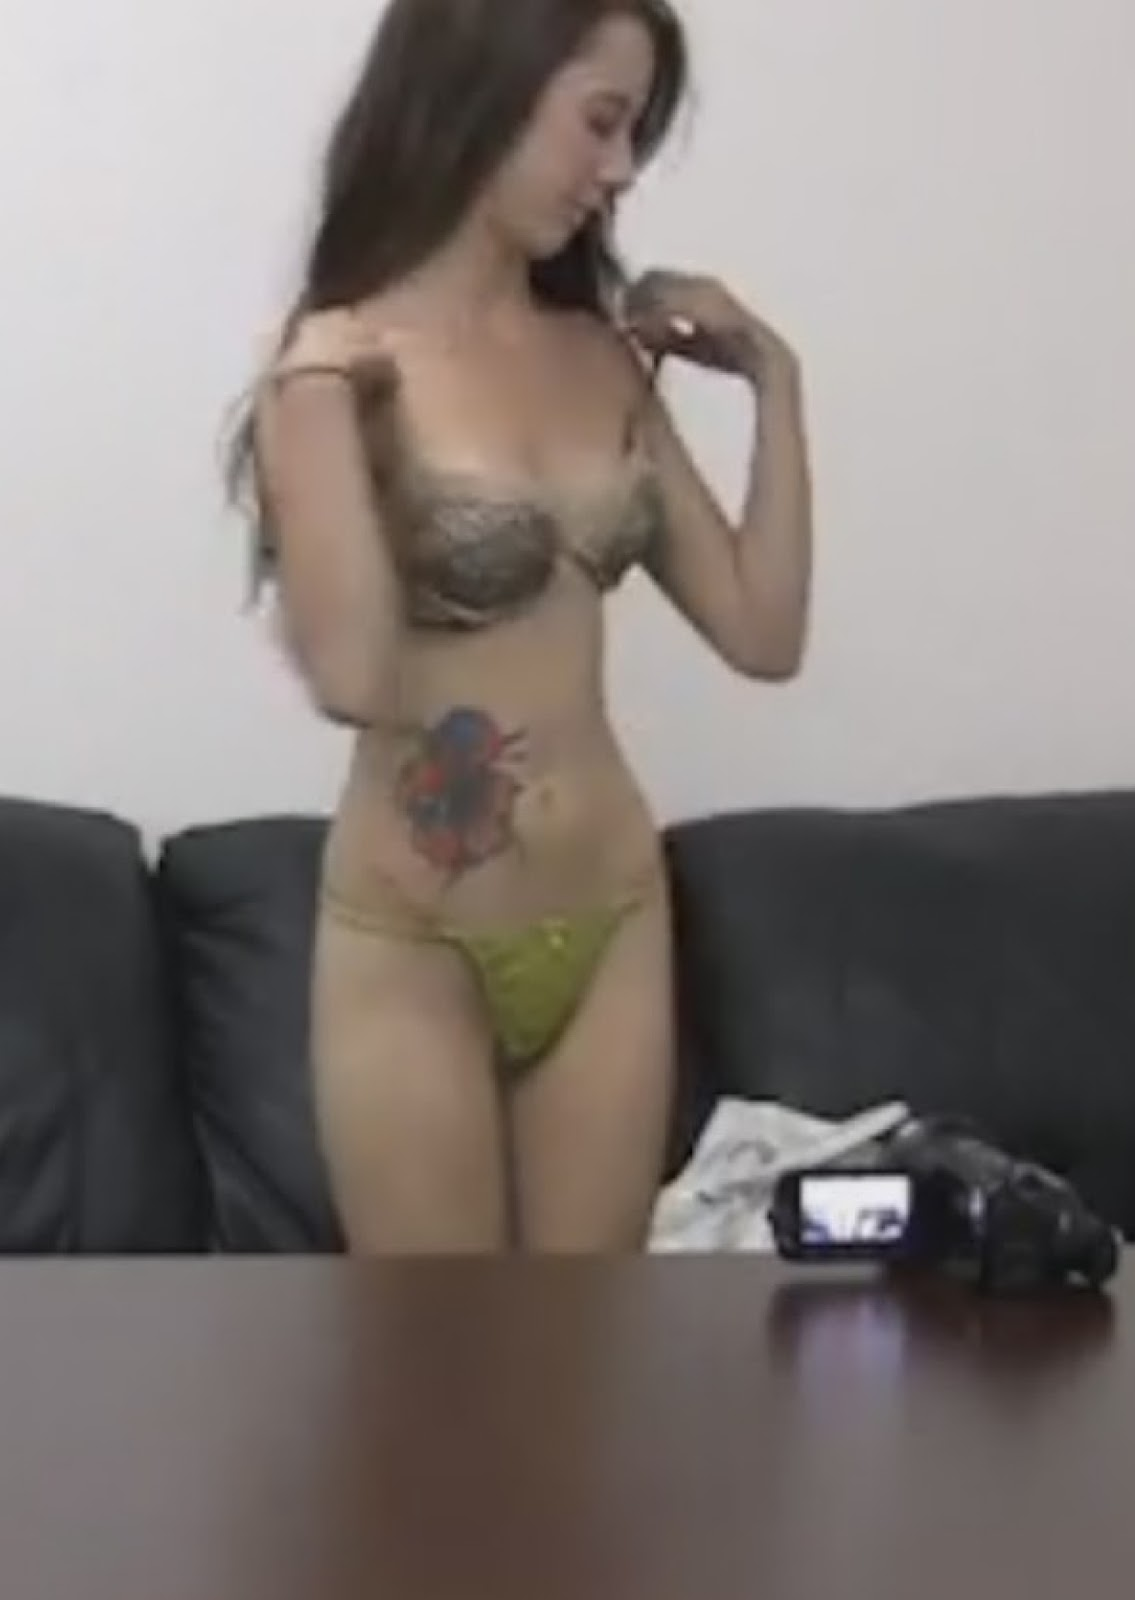 Sexxy Teen Fucking Trailers 29